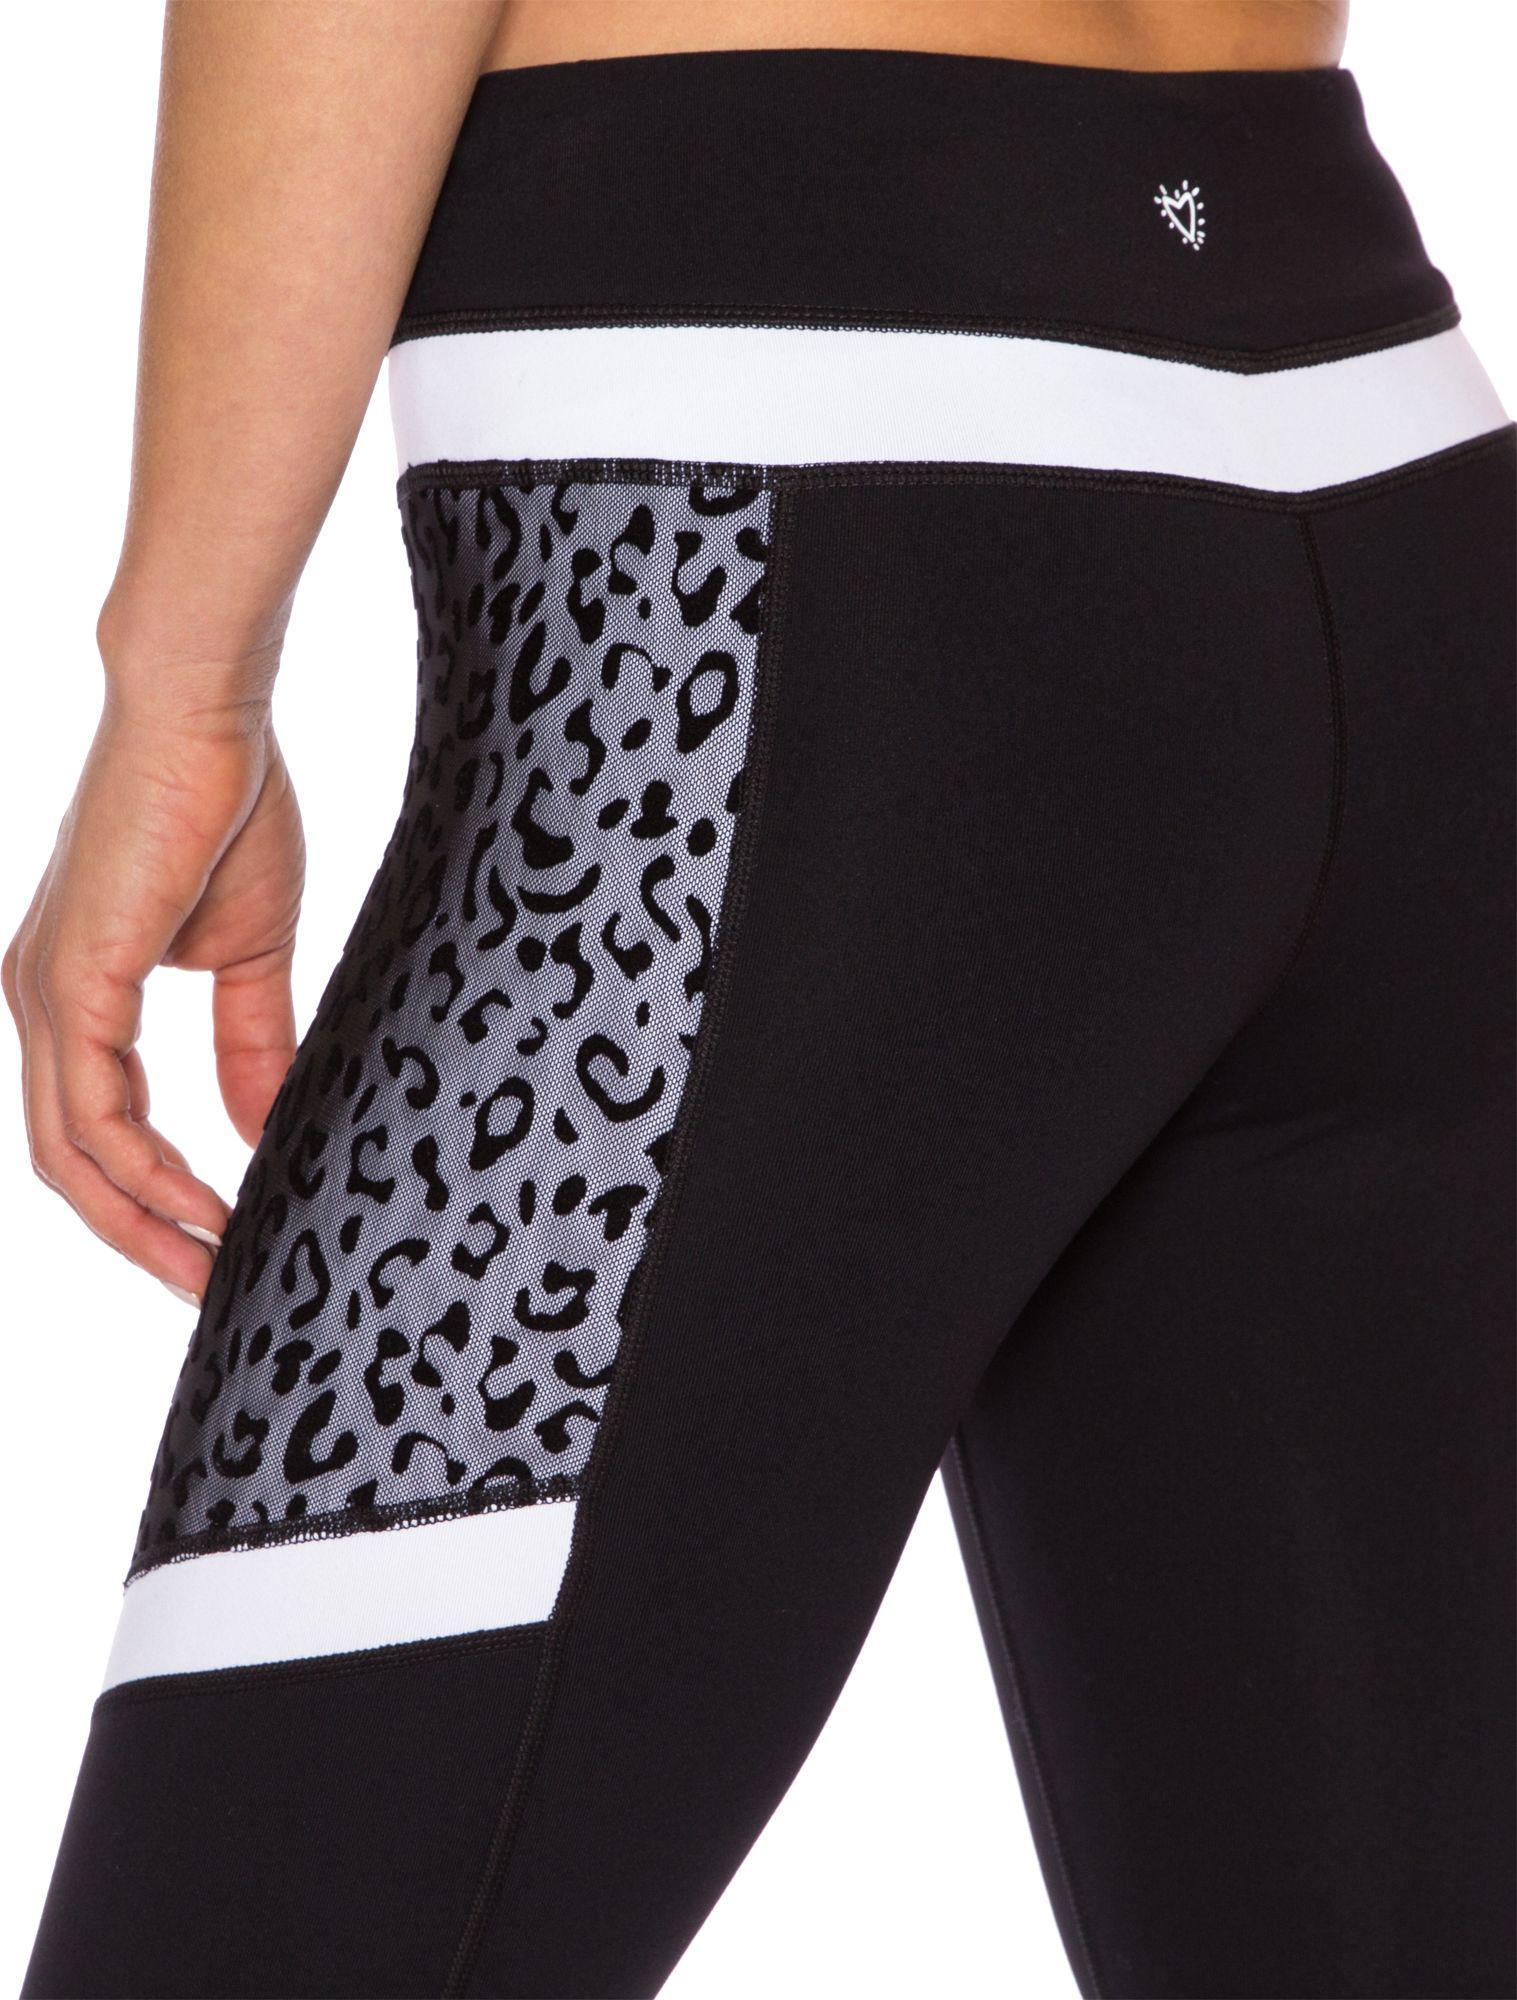 d473f39f2b9d Betsey Johnson Performance Leopard Colorblock Leggings in Black - Lyst